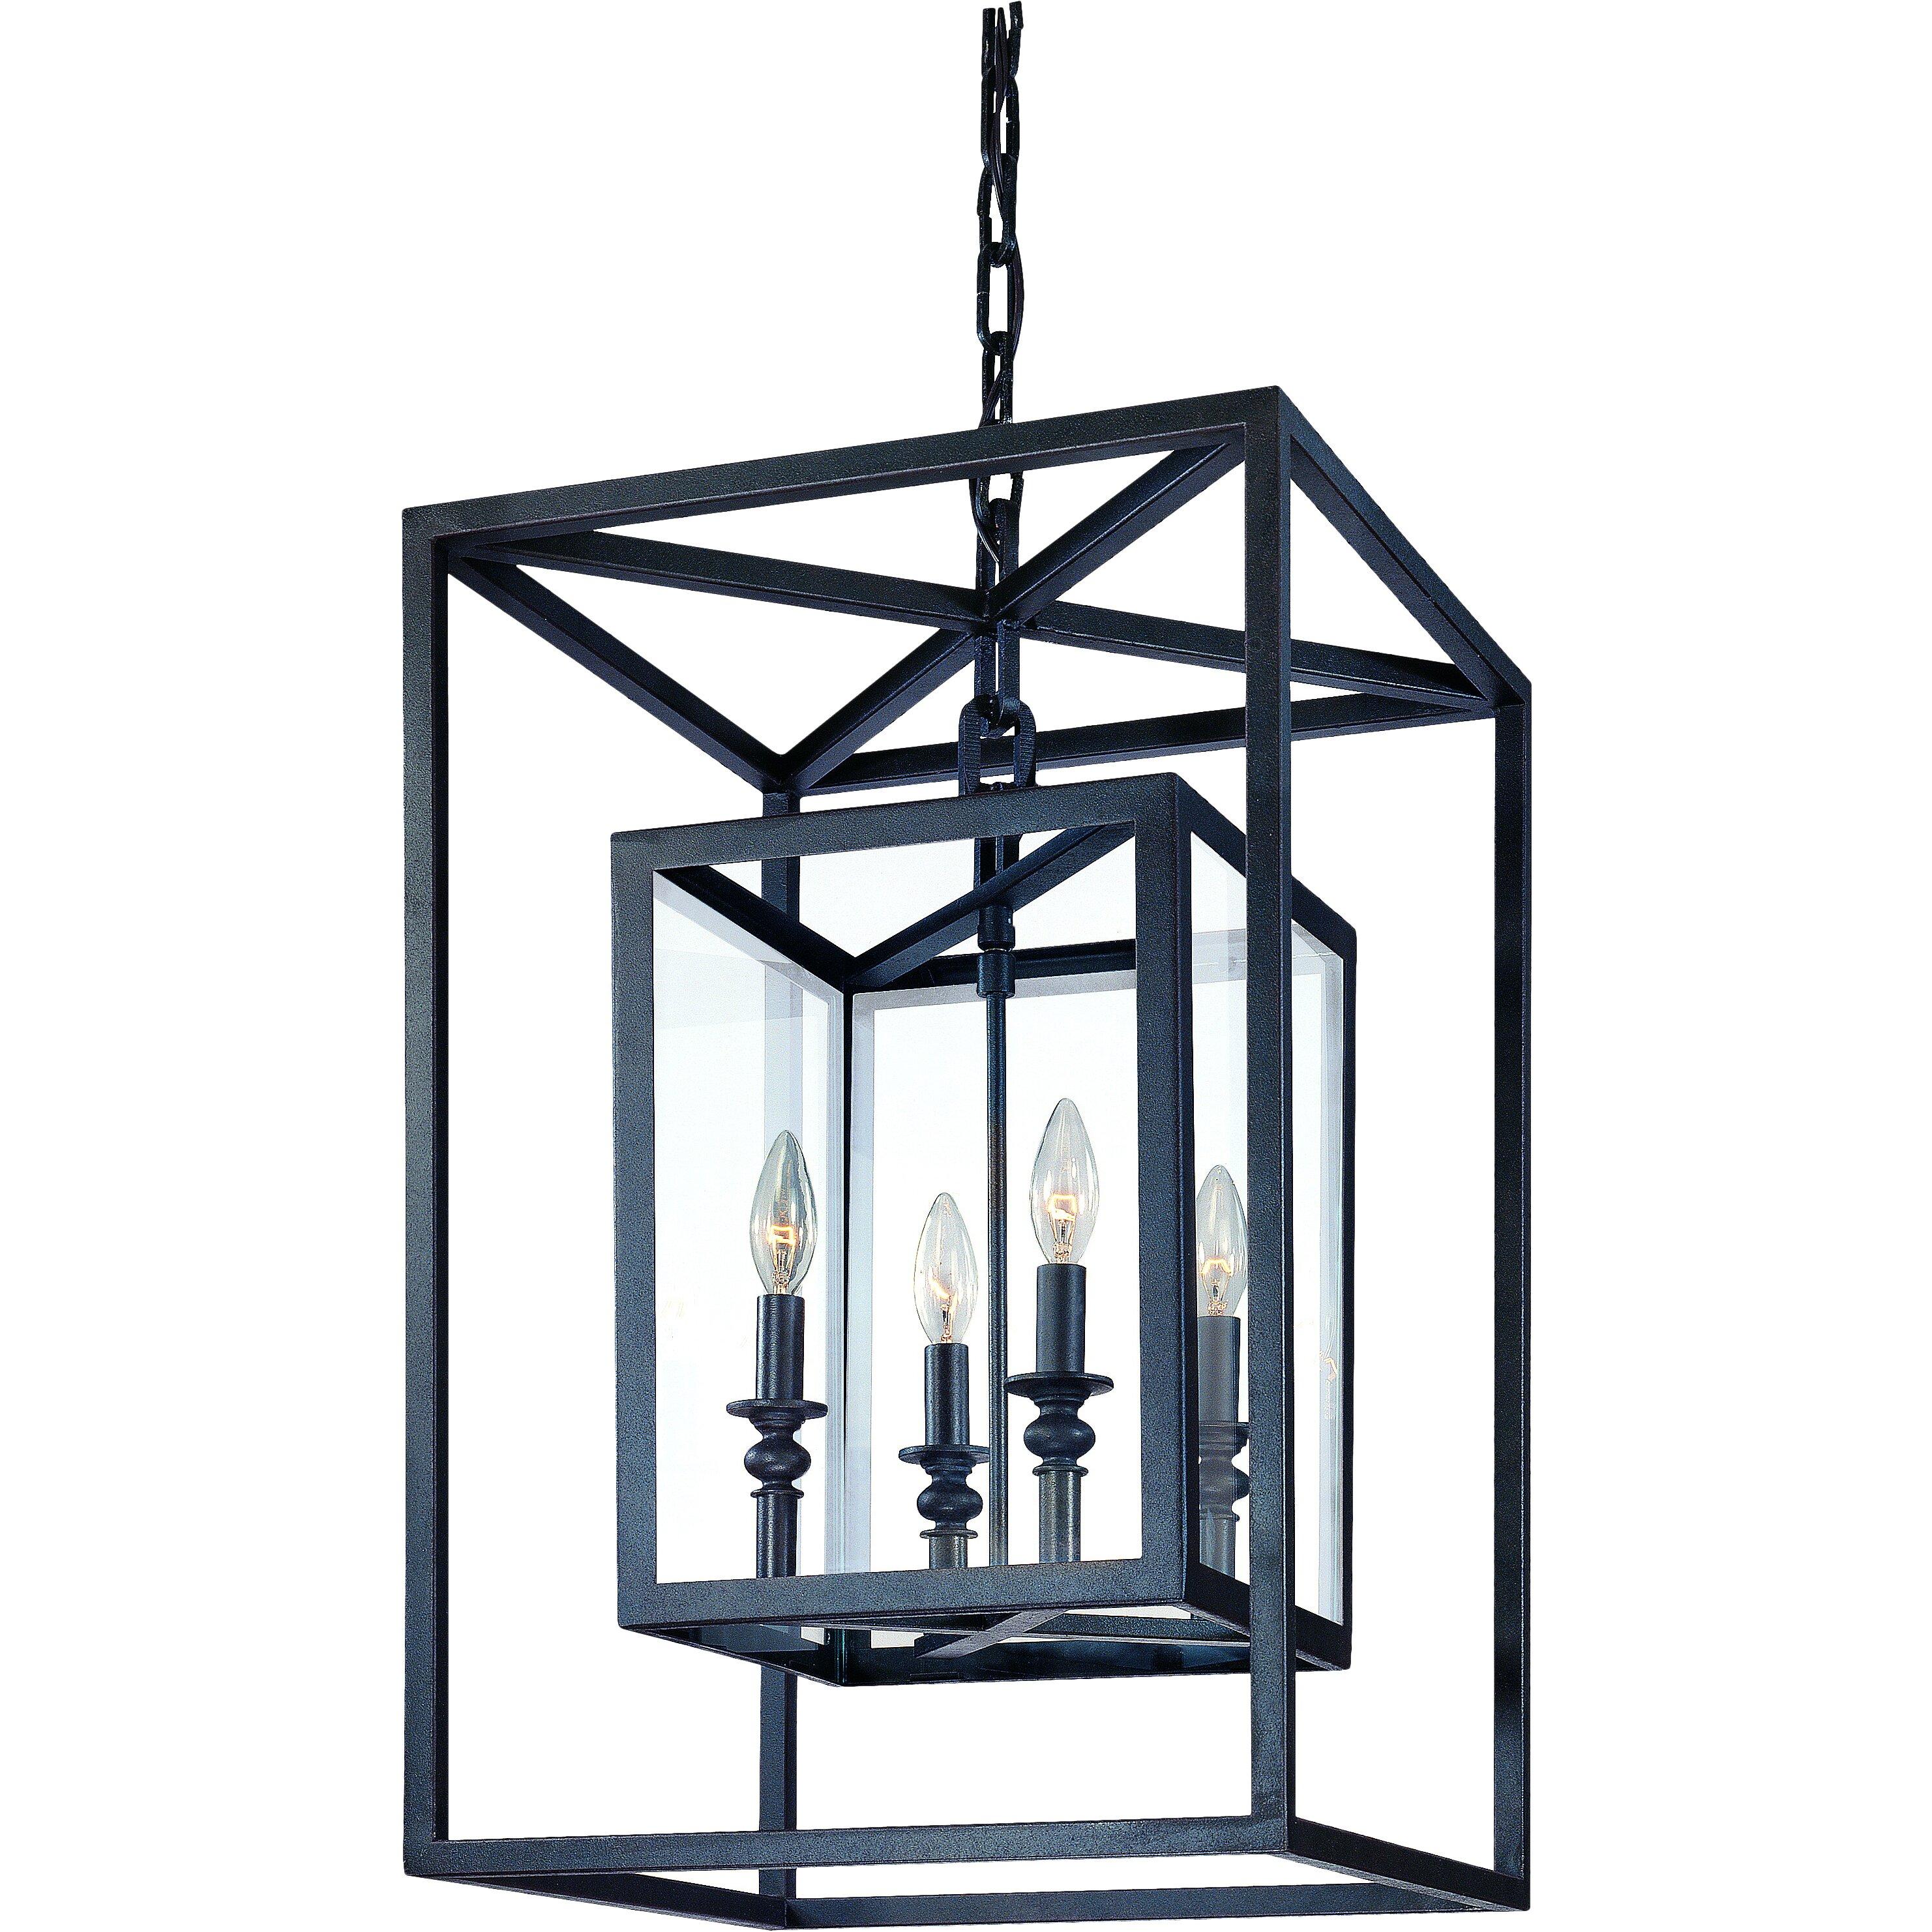 Medium Foyer Chandelier : Troy lighting morgan light medium foyer pendant